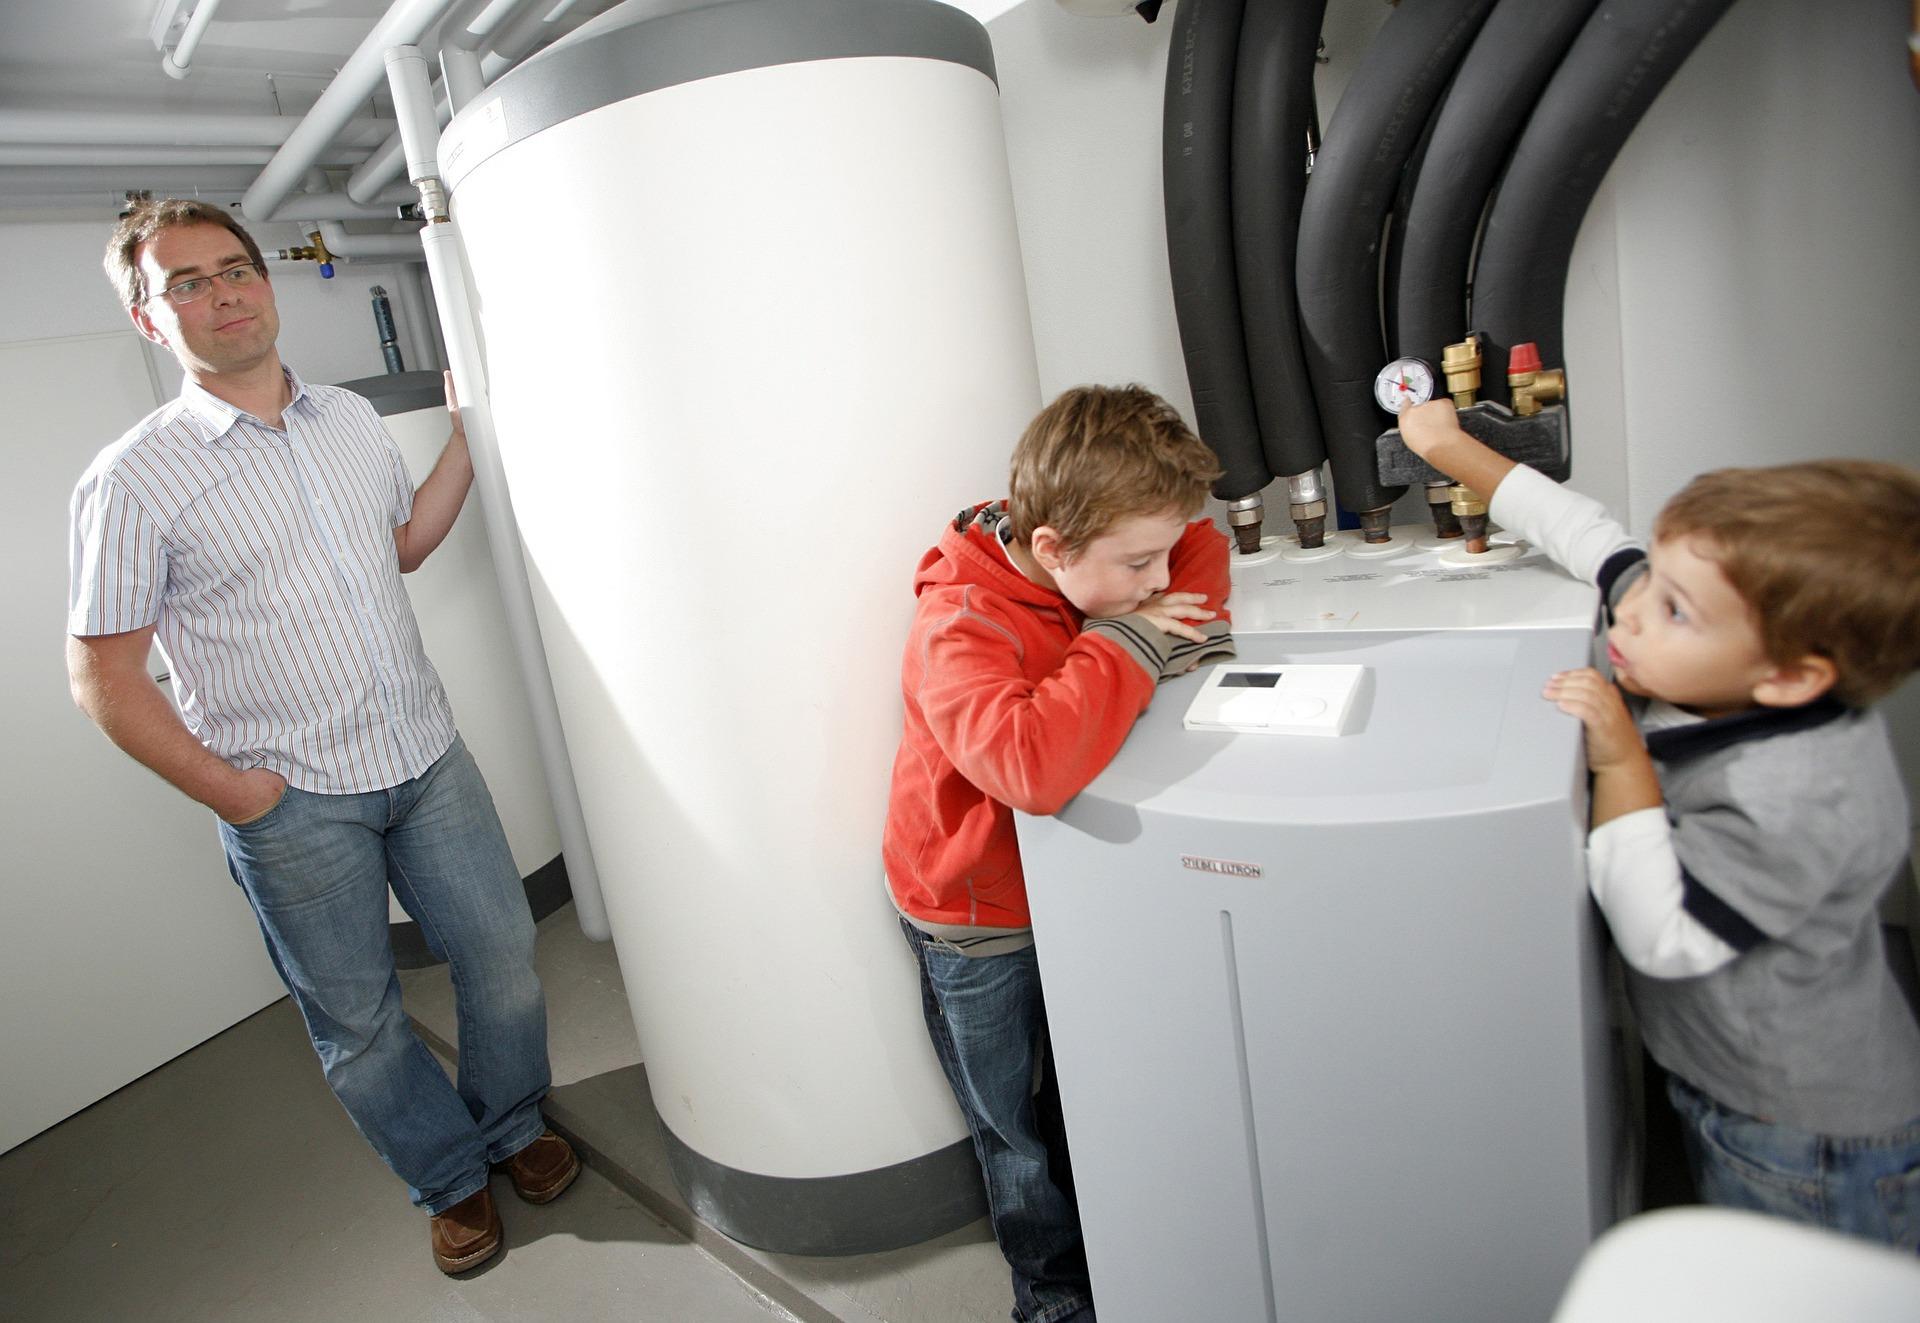 aln-heizung-energieeffizienz-waermepumpe